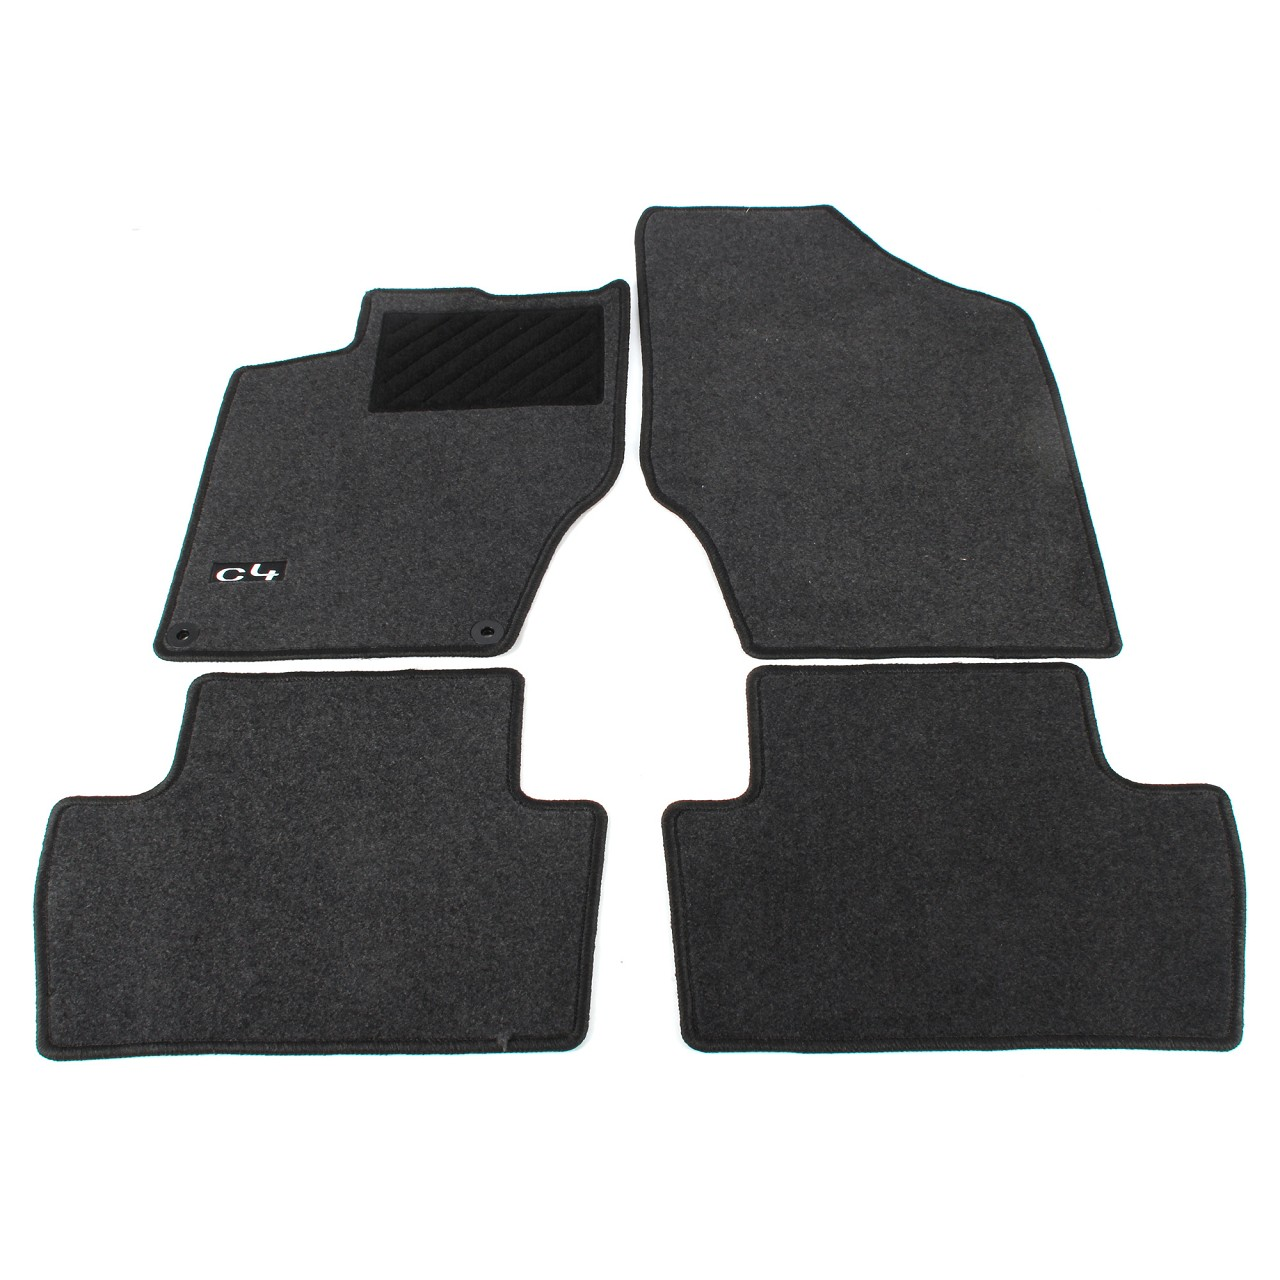 ORIGINAL Citroen Textilmatten Fußmatten Automatten Satz C4 II DS4 4-tlg 9464.FJ